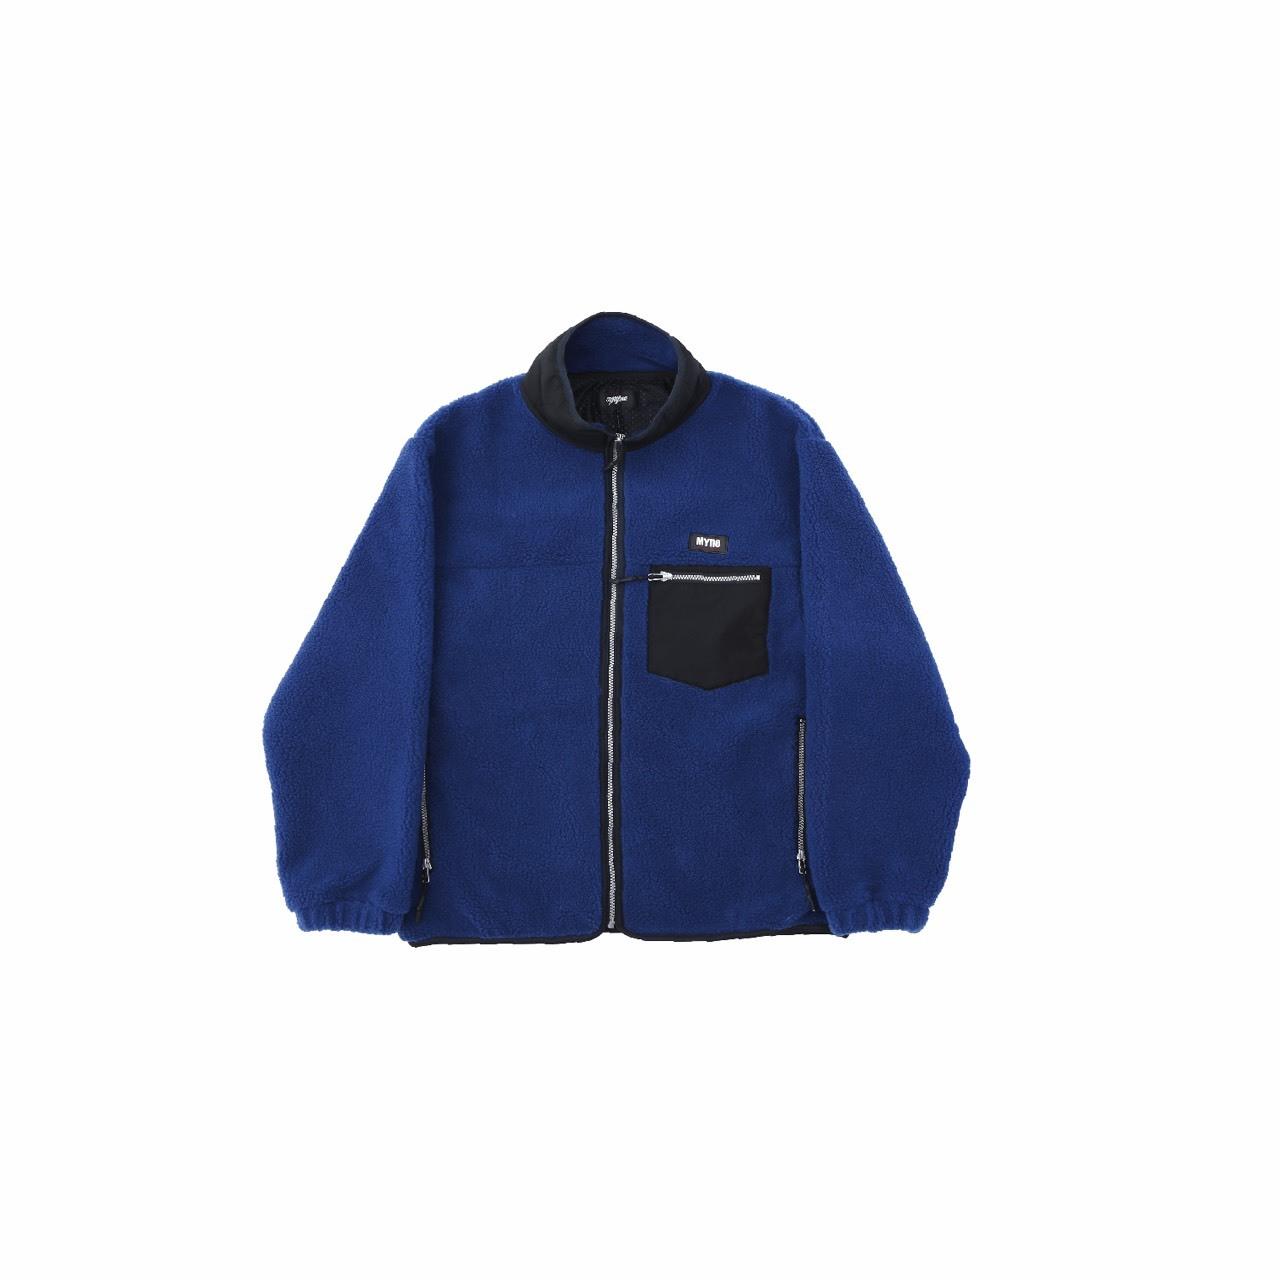 【10%OFF】Boa fleece blouson / BLUE - 画像1